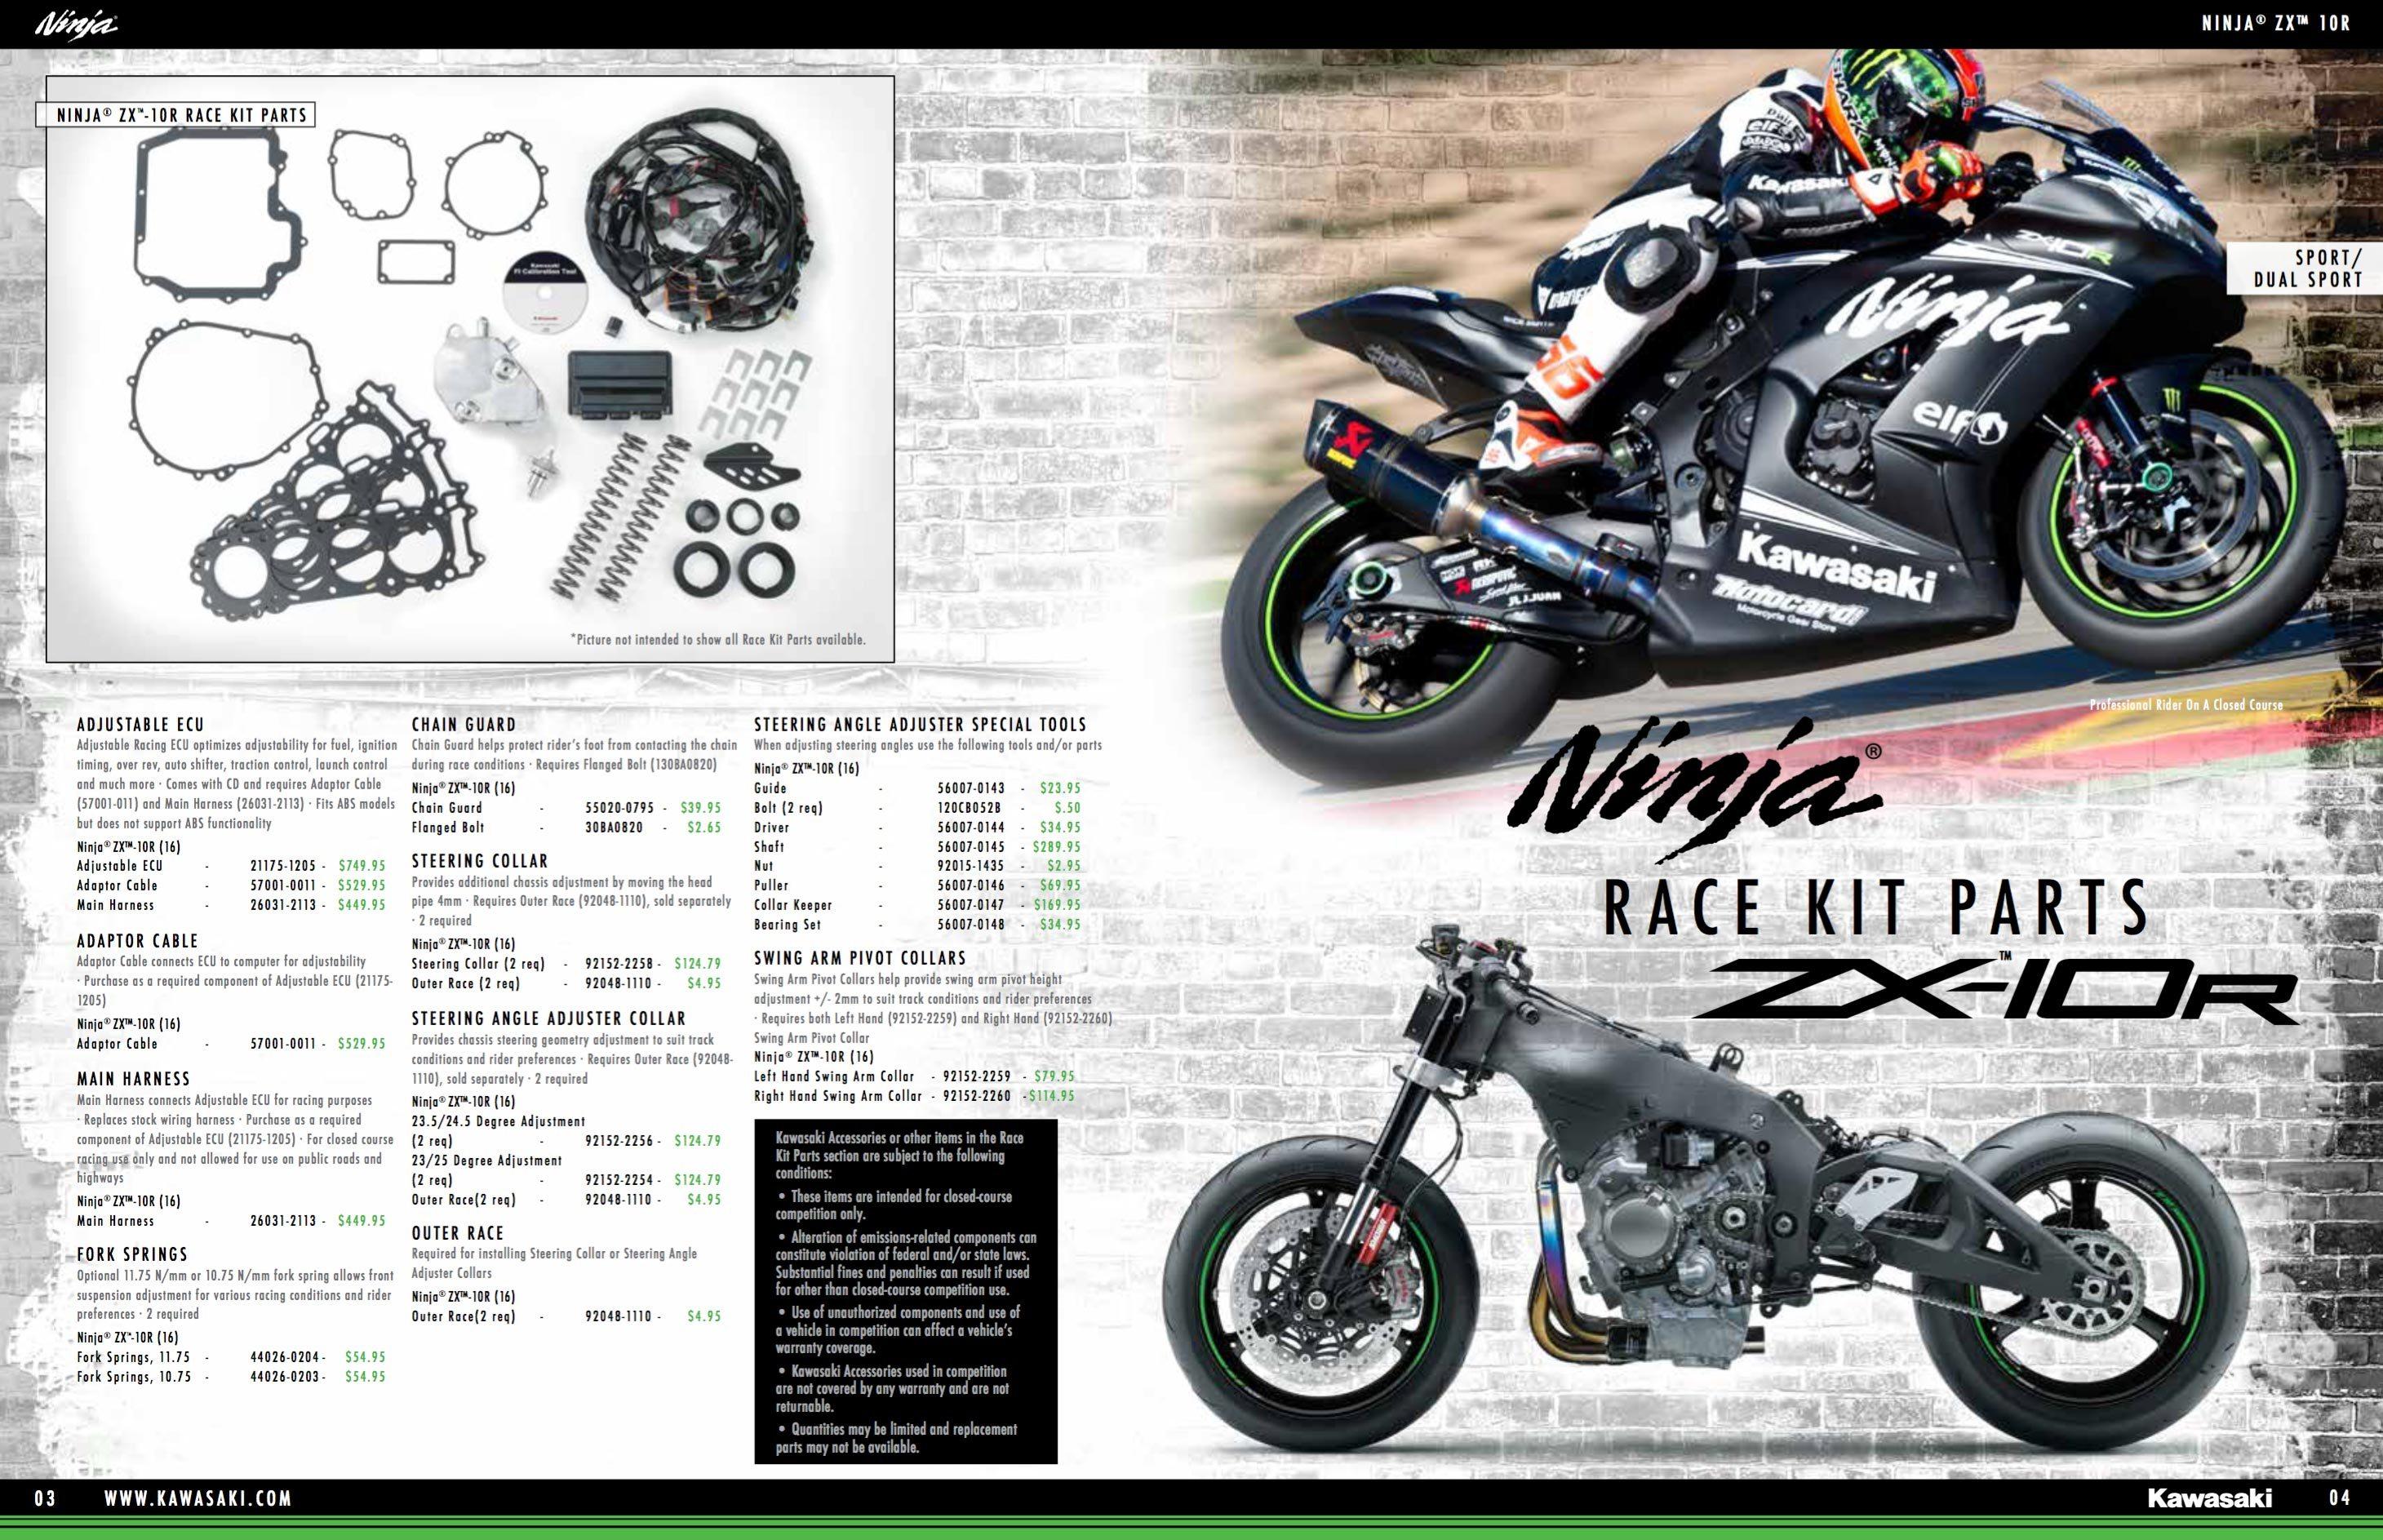 New Kawasaki Ninja Zx 10r Racing Parts Catalogue Released Bmw Motorcycle Wiring Harness 2016 Race Kit